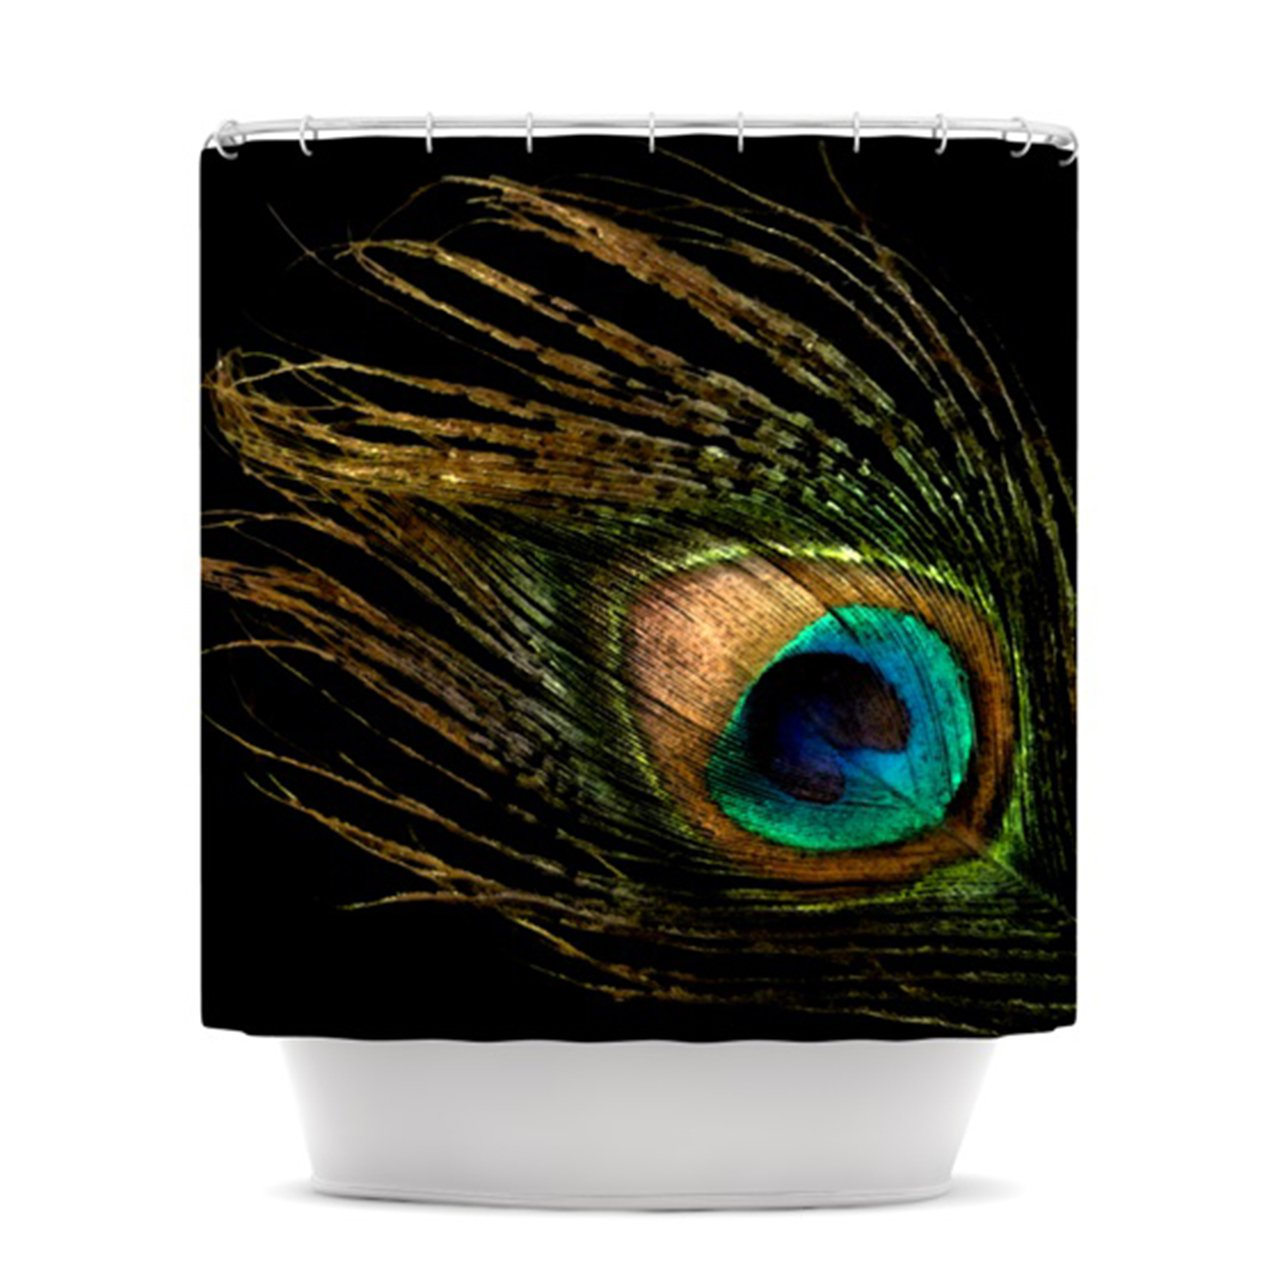 Alison Coxon Peacock Black Shower Curtain, 69 by 70-Inch